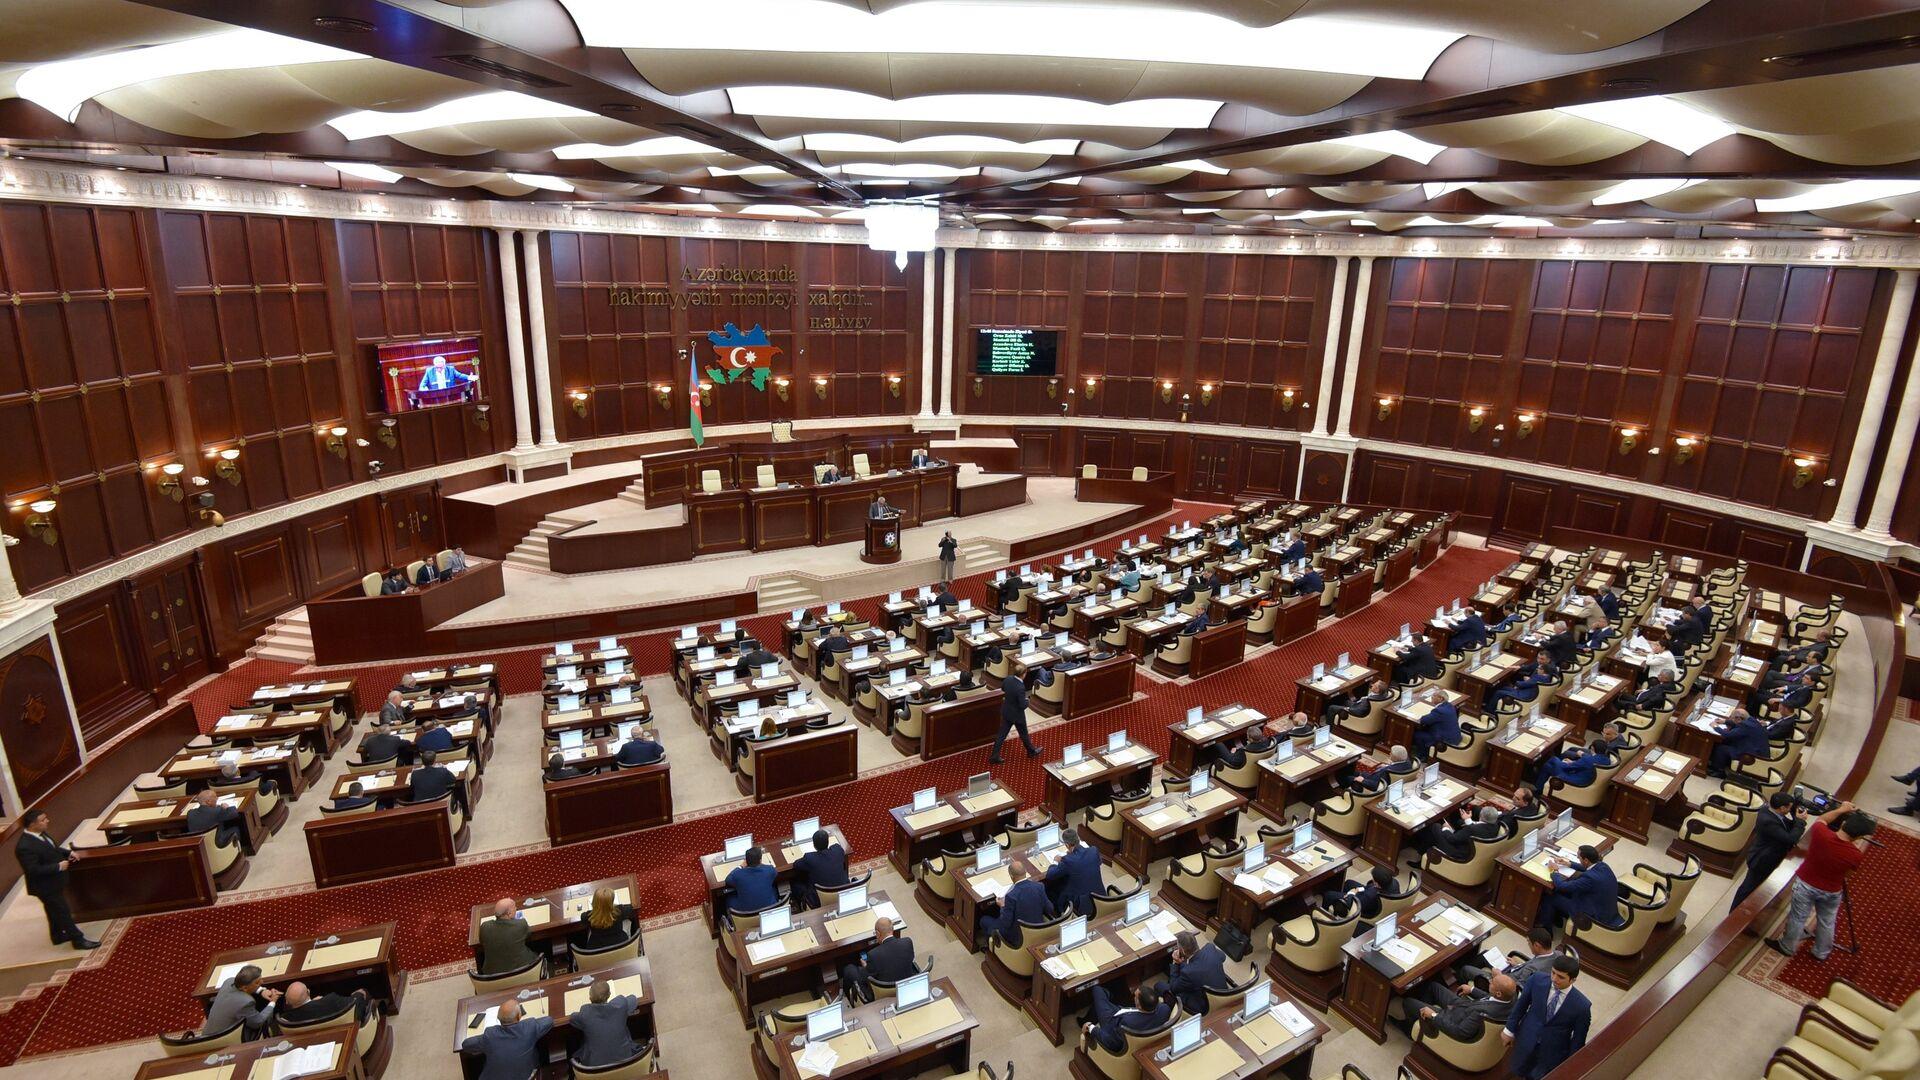 Заседание Милли Меджлиса (Парламента) Азербайджана - Sputnik Արմենիա, 1920, 31.07.2021